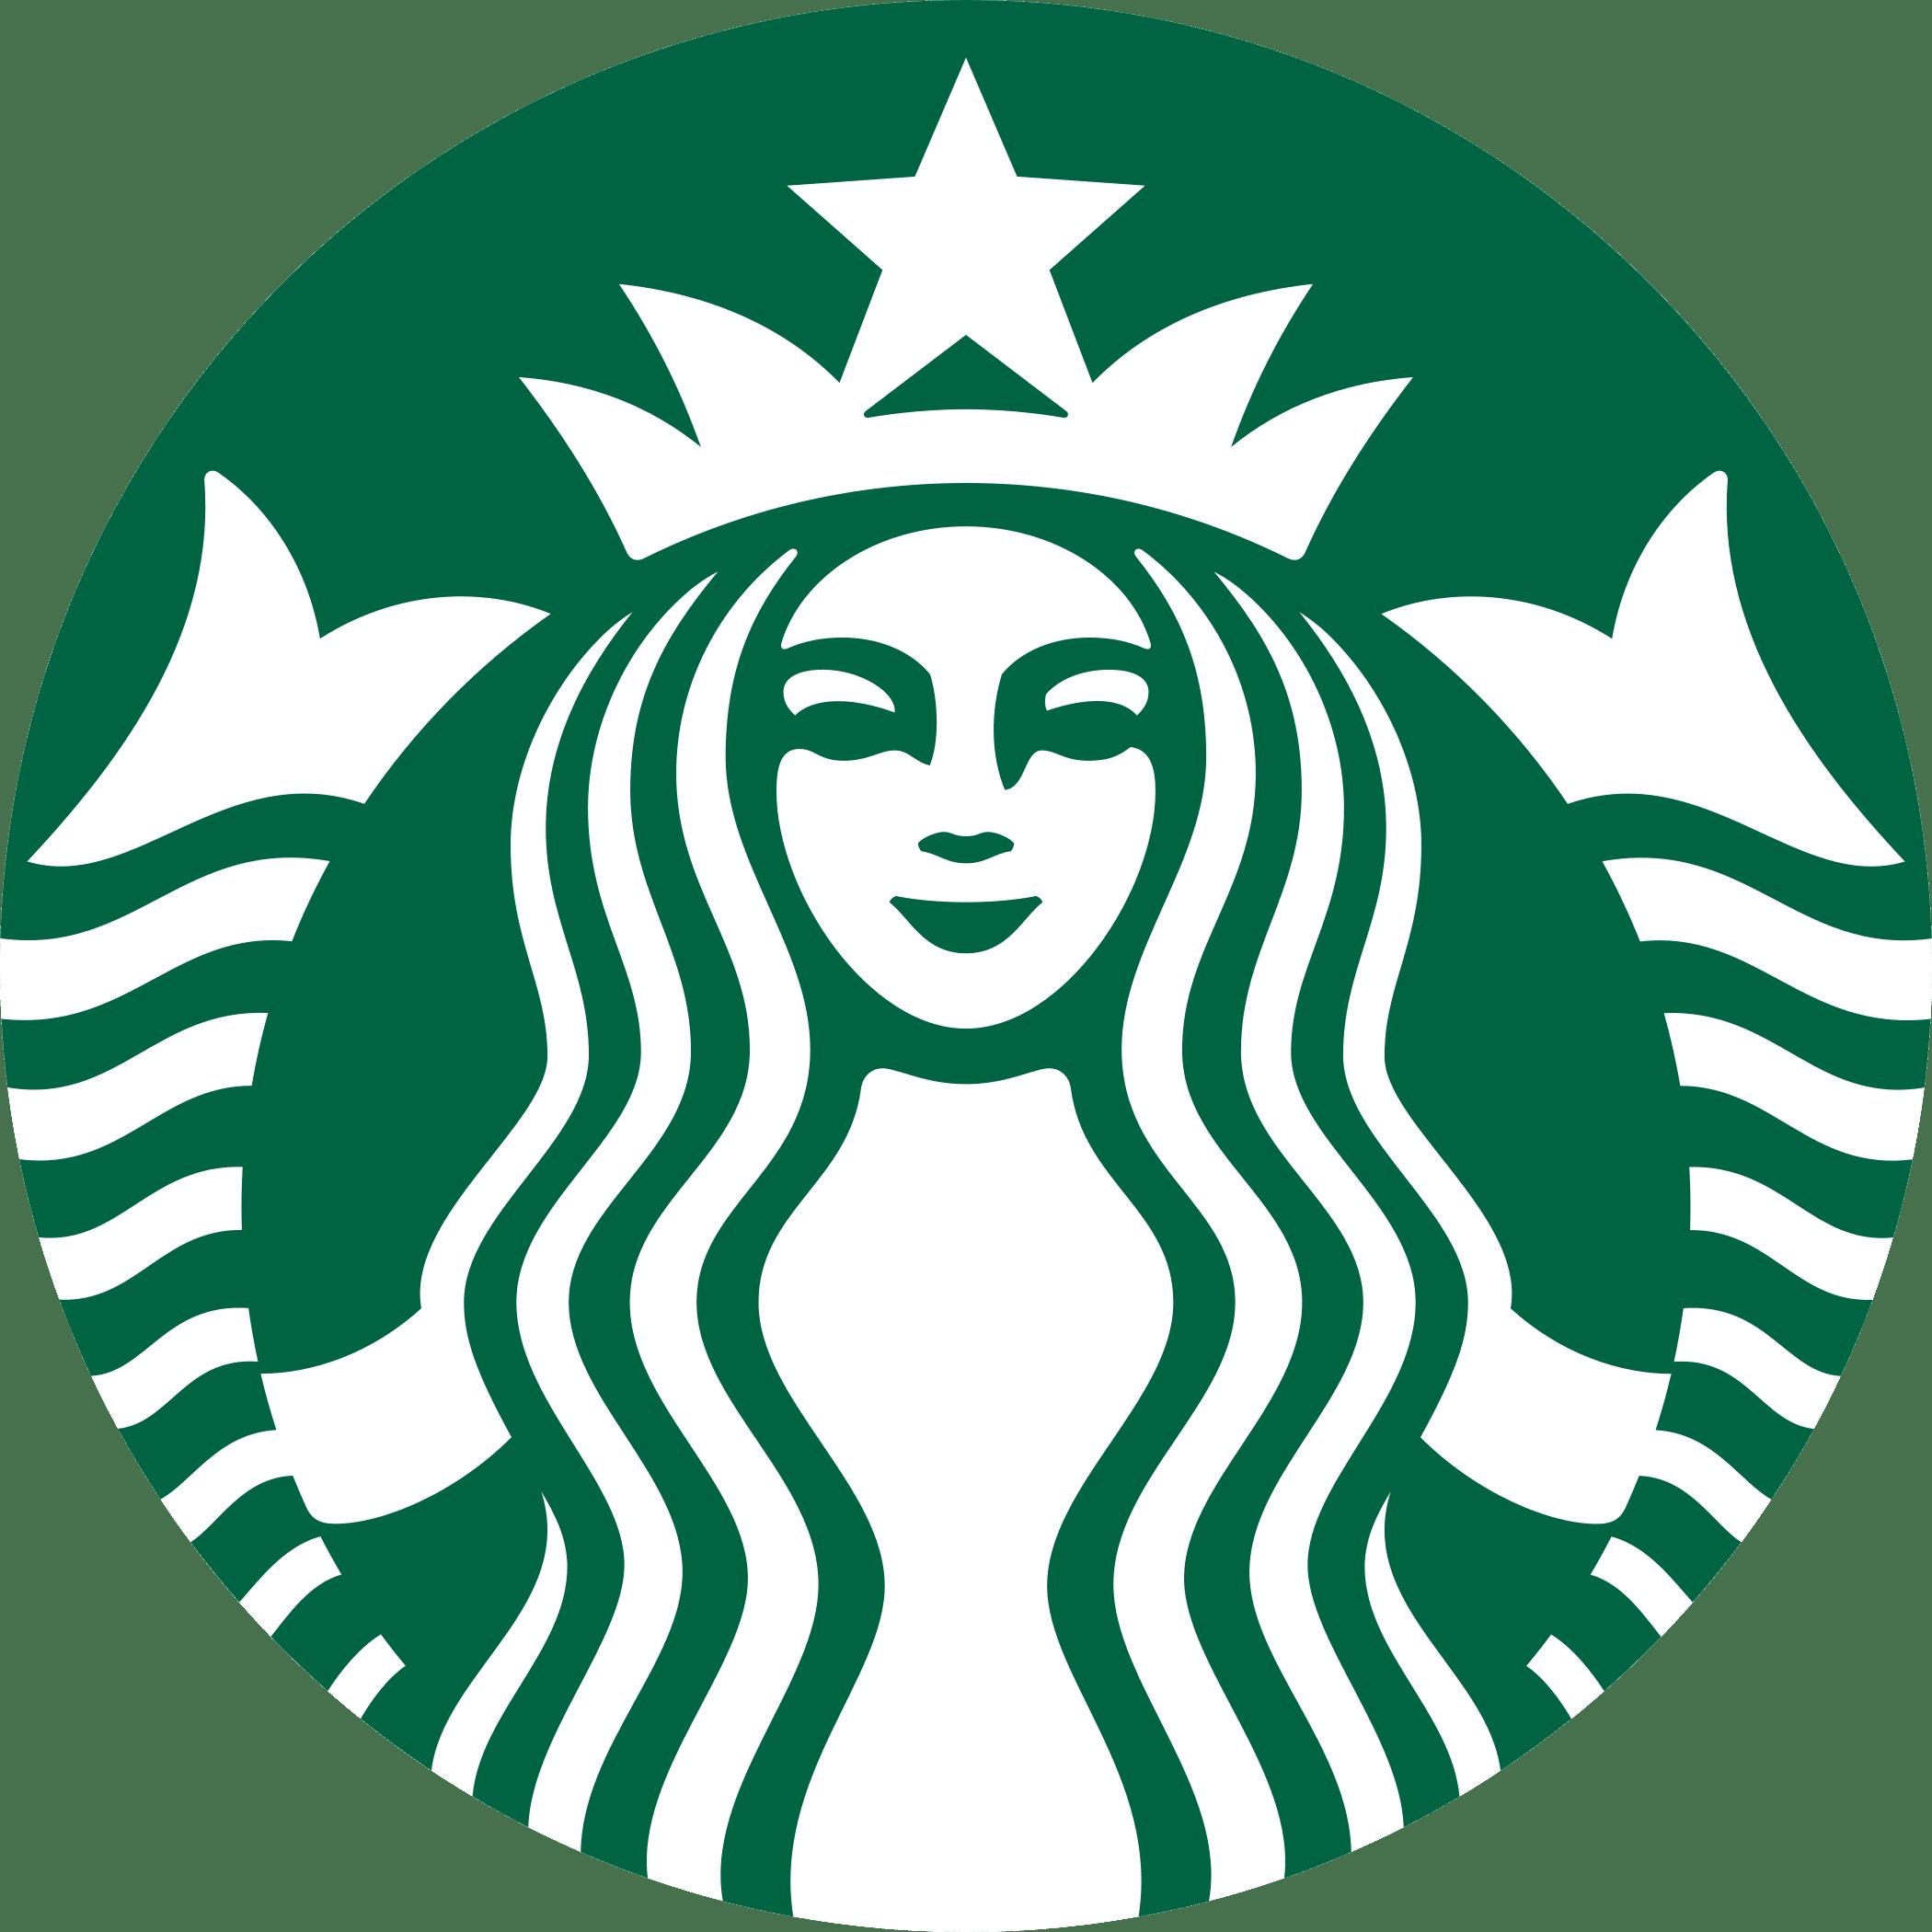 https://www.pneumaticconveyingsolutions.com/wp-content/uploads/starbucks-logo-1.png